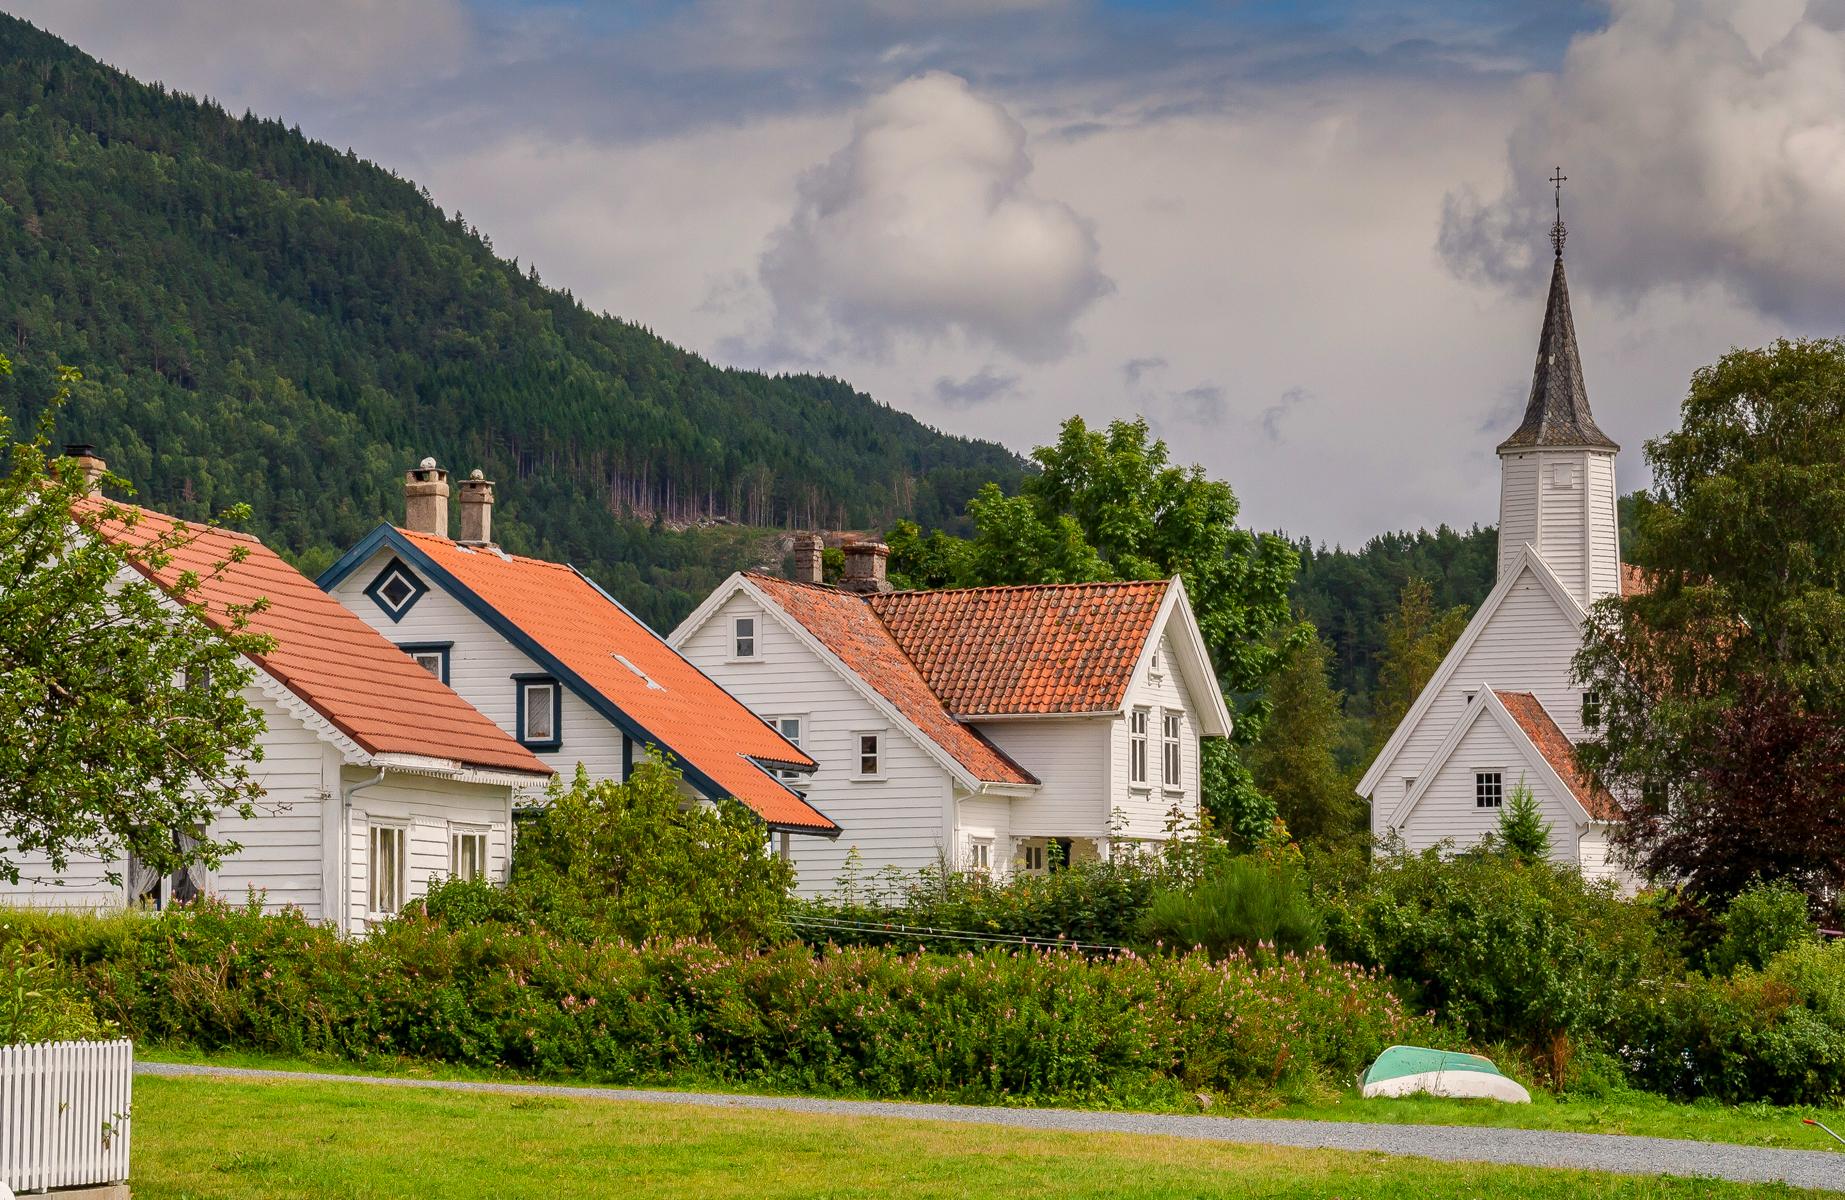 White Jelsa, Norway